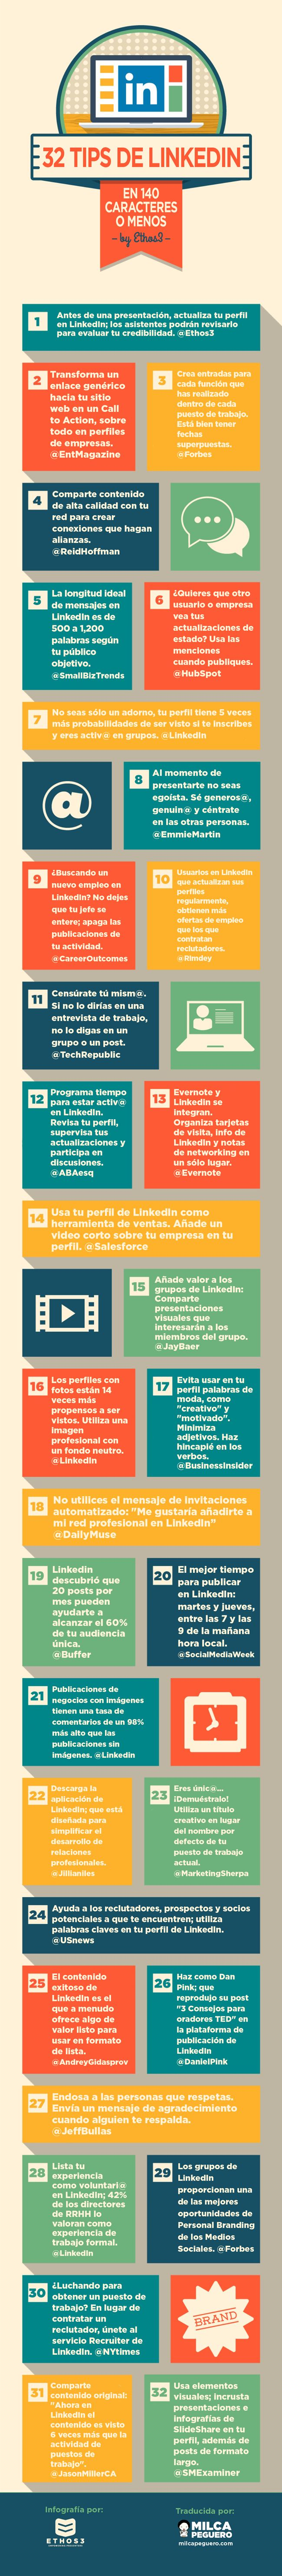 33 consejos sobre Linkedin. #infografia